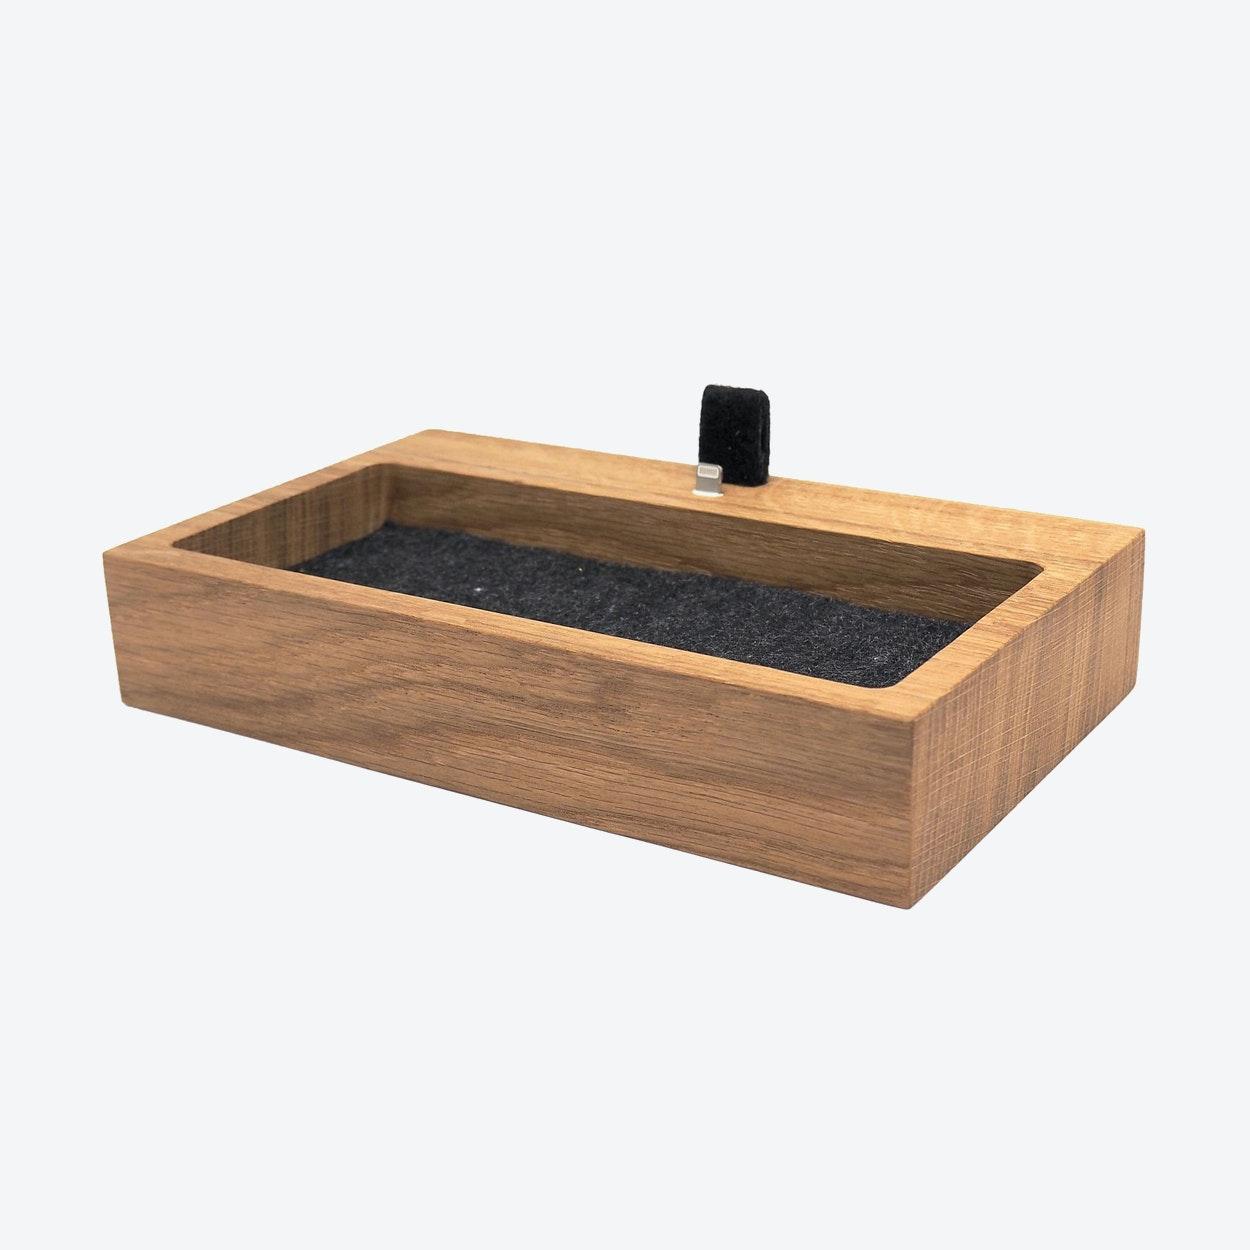 Oak IPhone Dock With Organizer By Oakywood